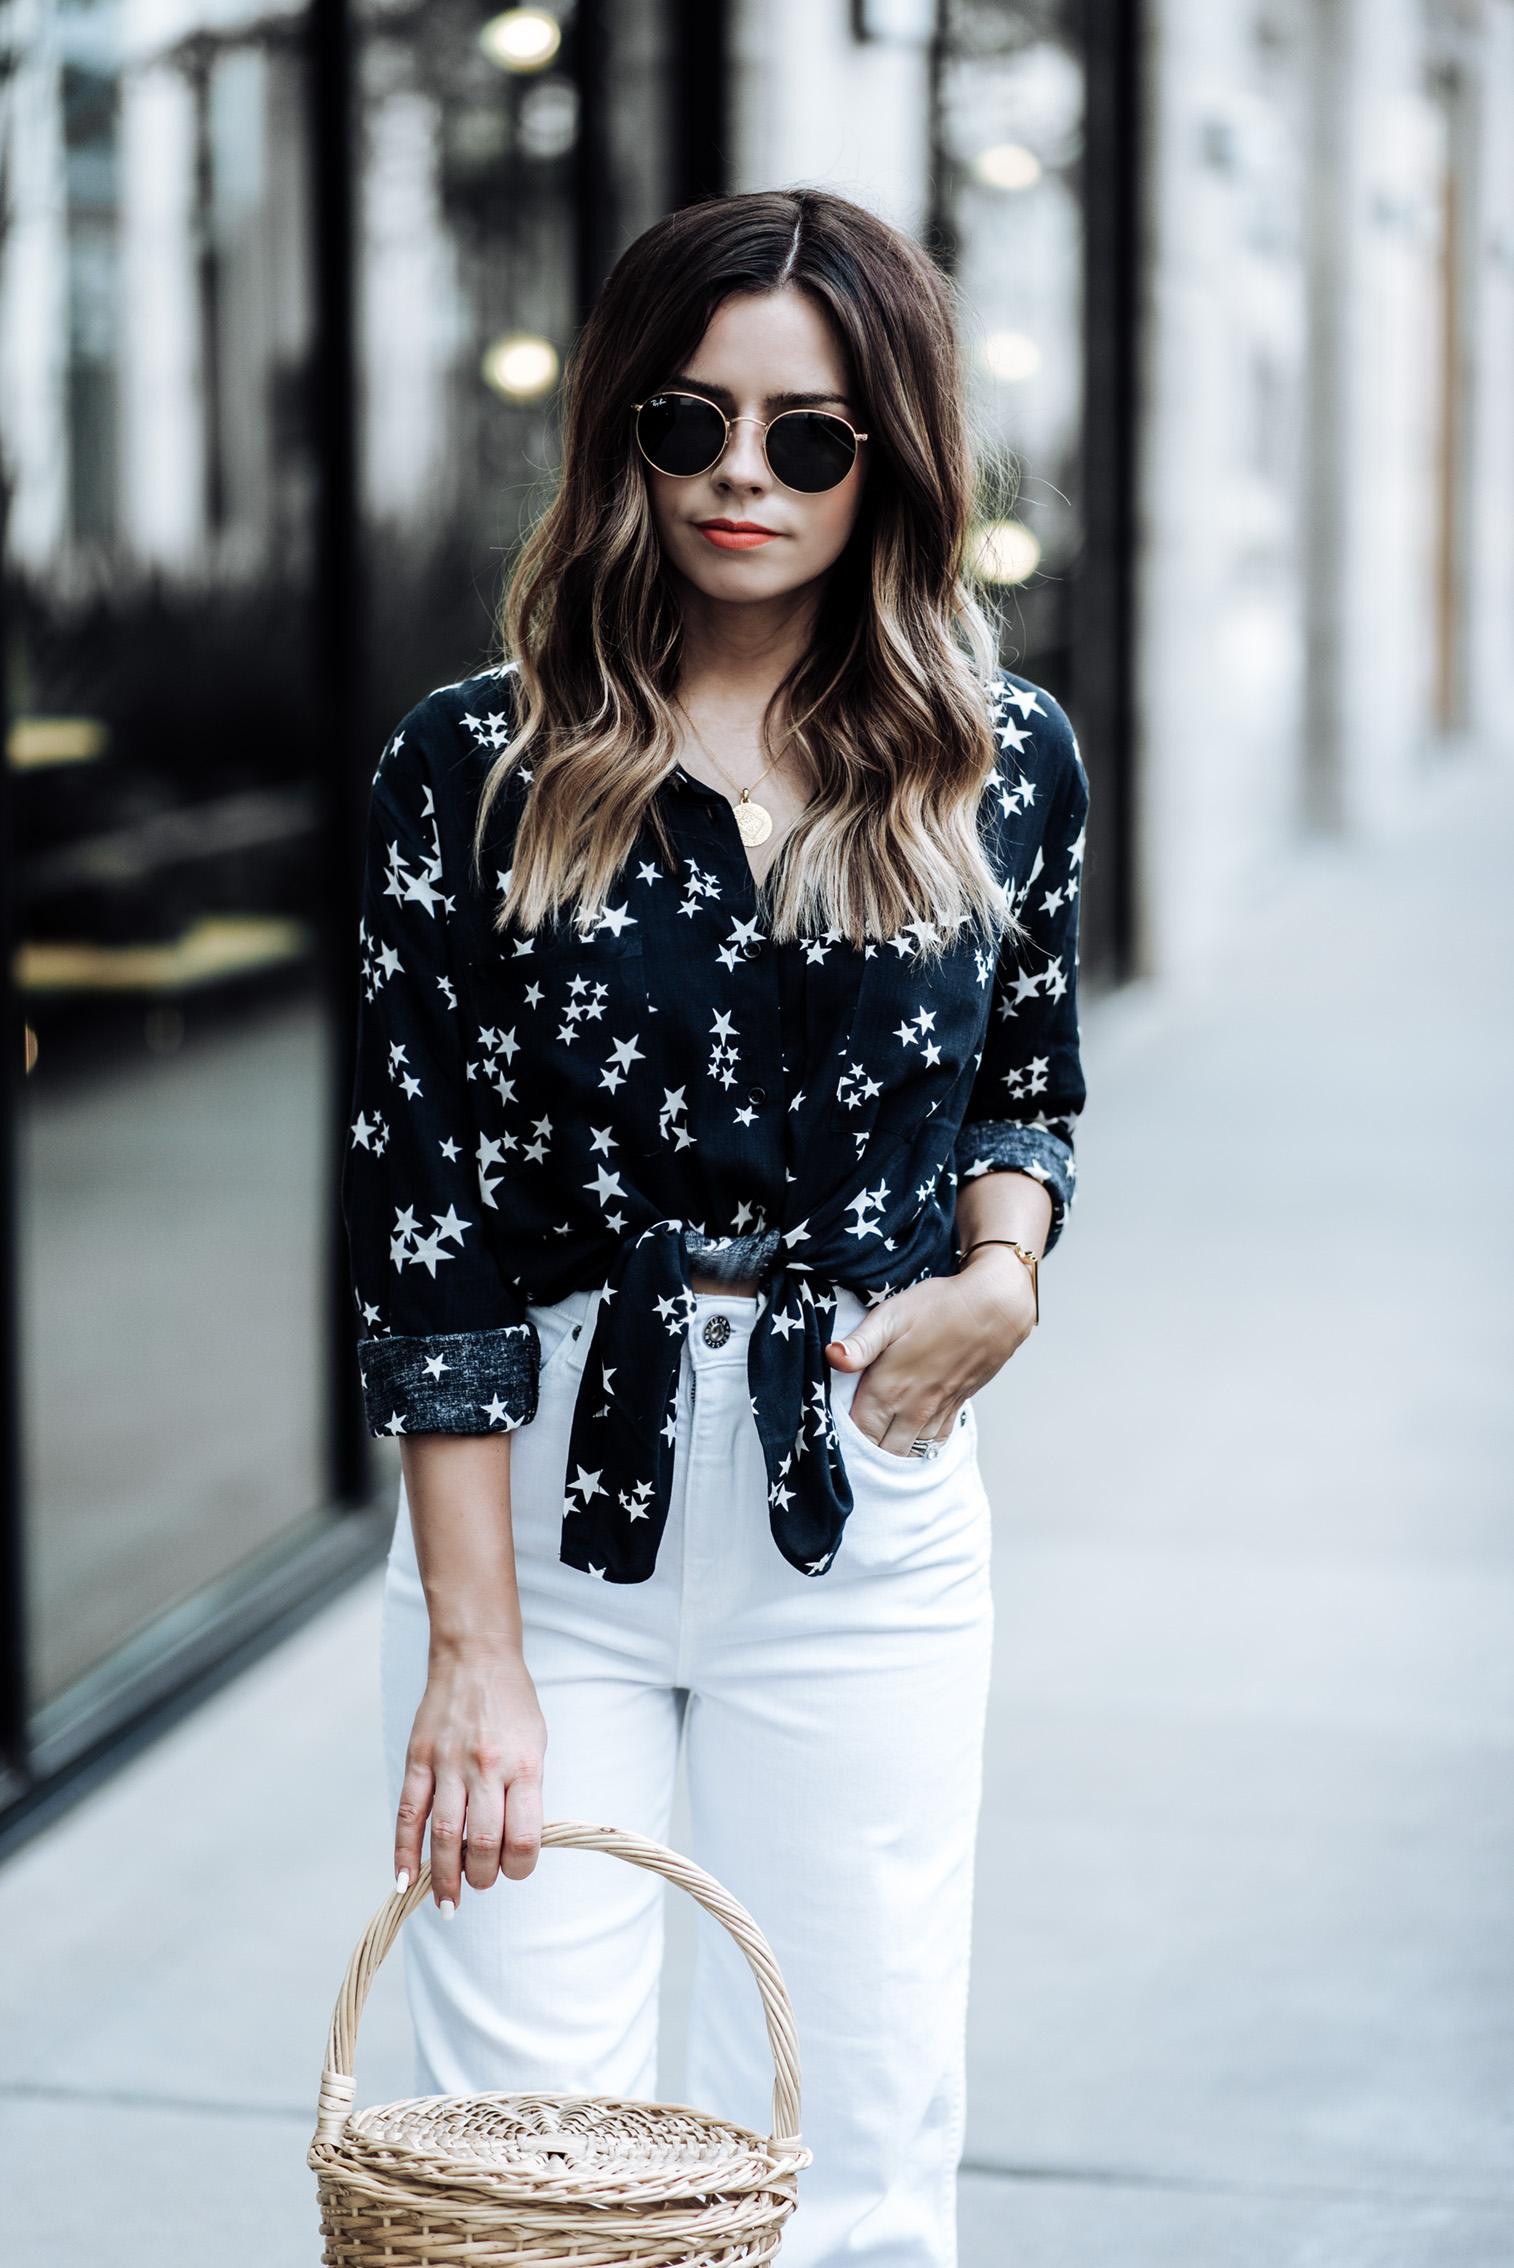 Houston fashion and lifestyle blogger Tiffany Jais | {C/O} The Yvette wide leg pant by AGJeans | Straw basket bag | Sincerely Jules Ryder shirt | Mini Marie pendant| Satin bow slides (similar here)